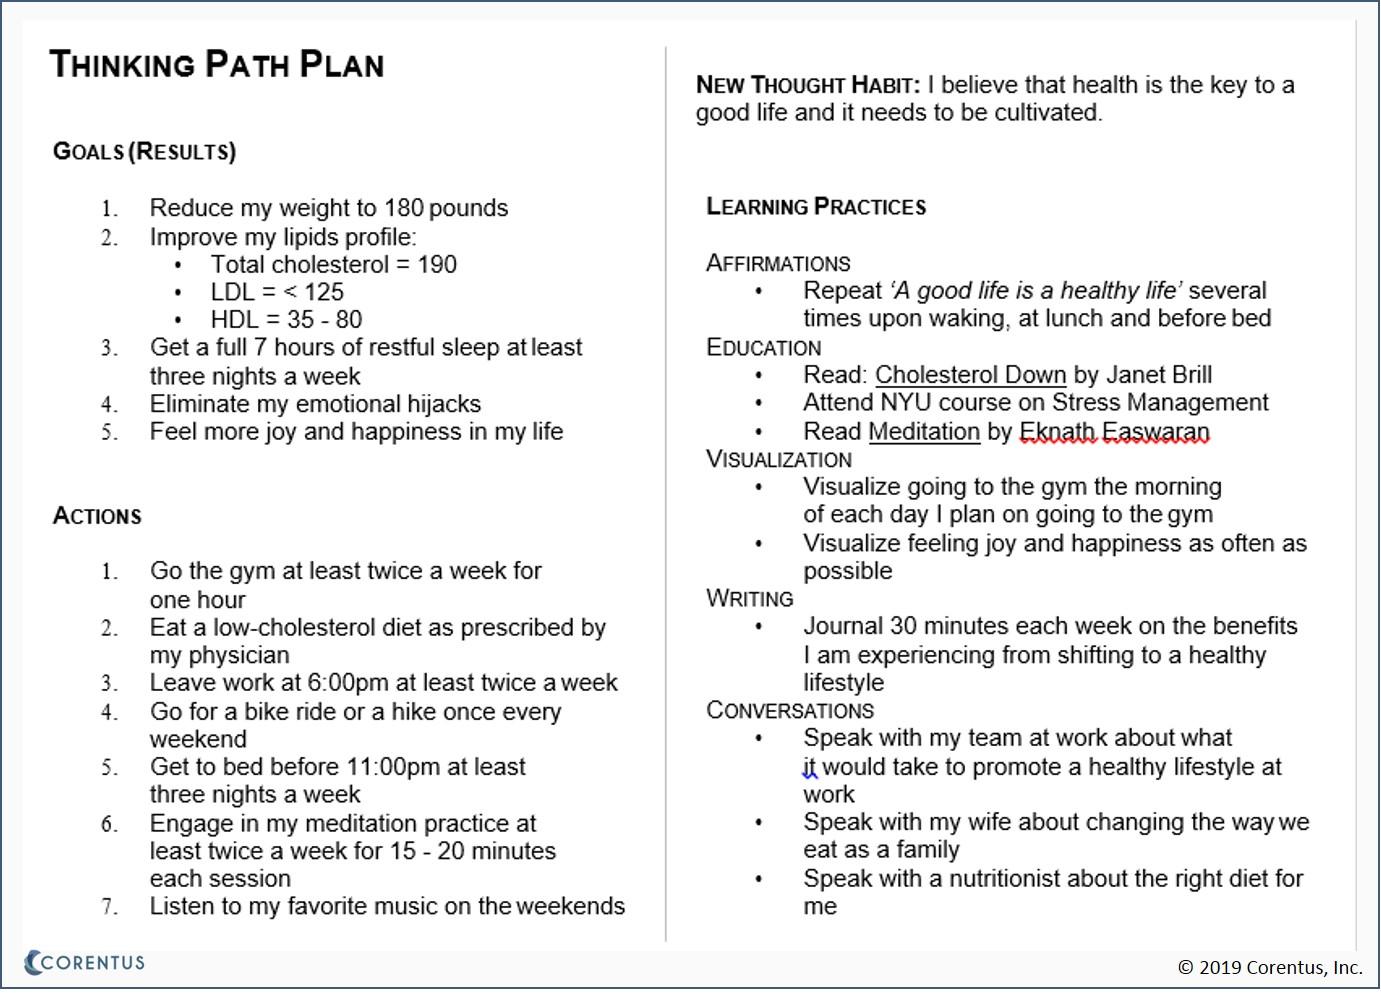 Corentus - The Thinking Path Plan 4 .jpg